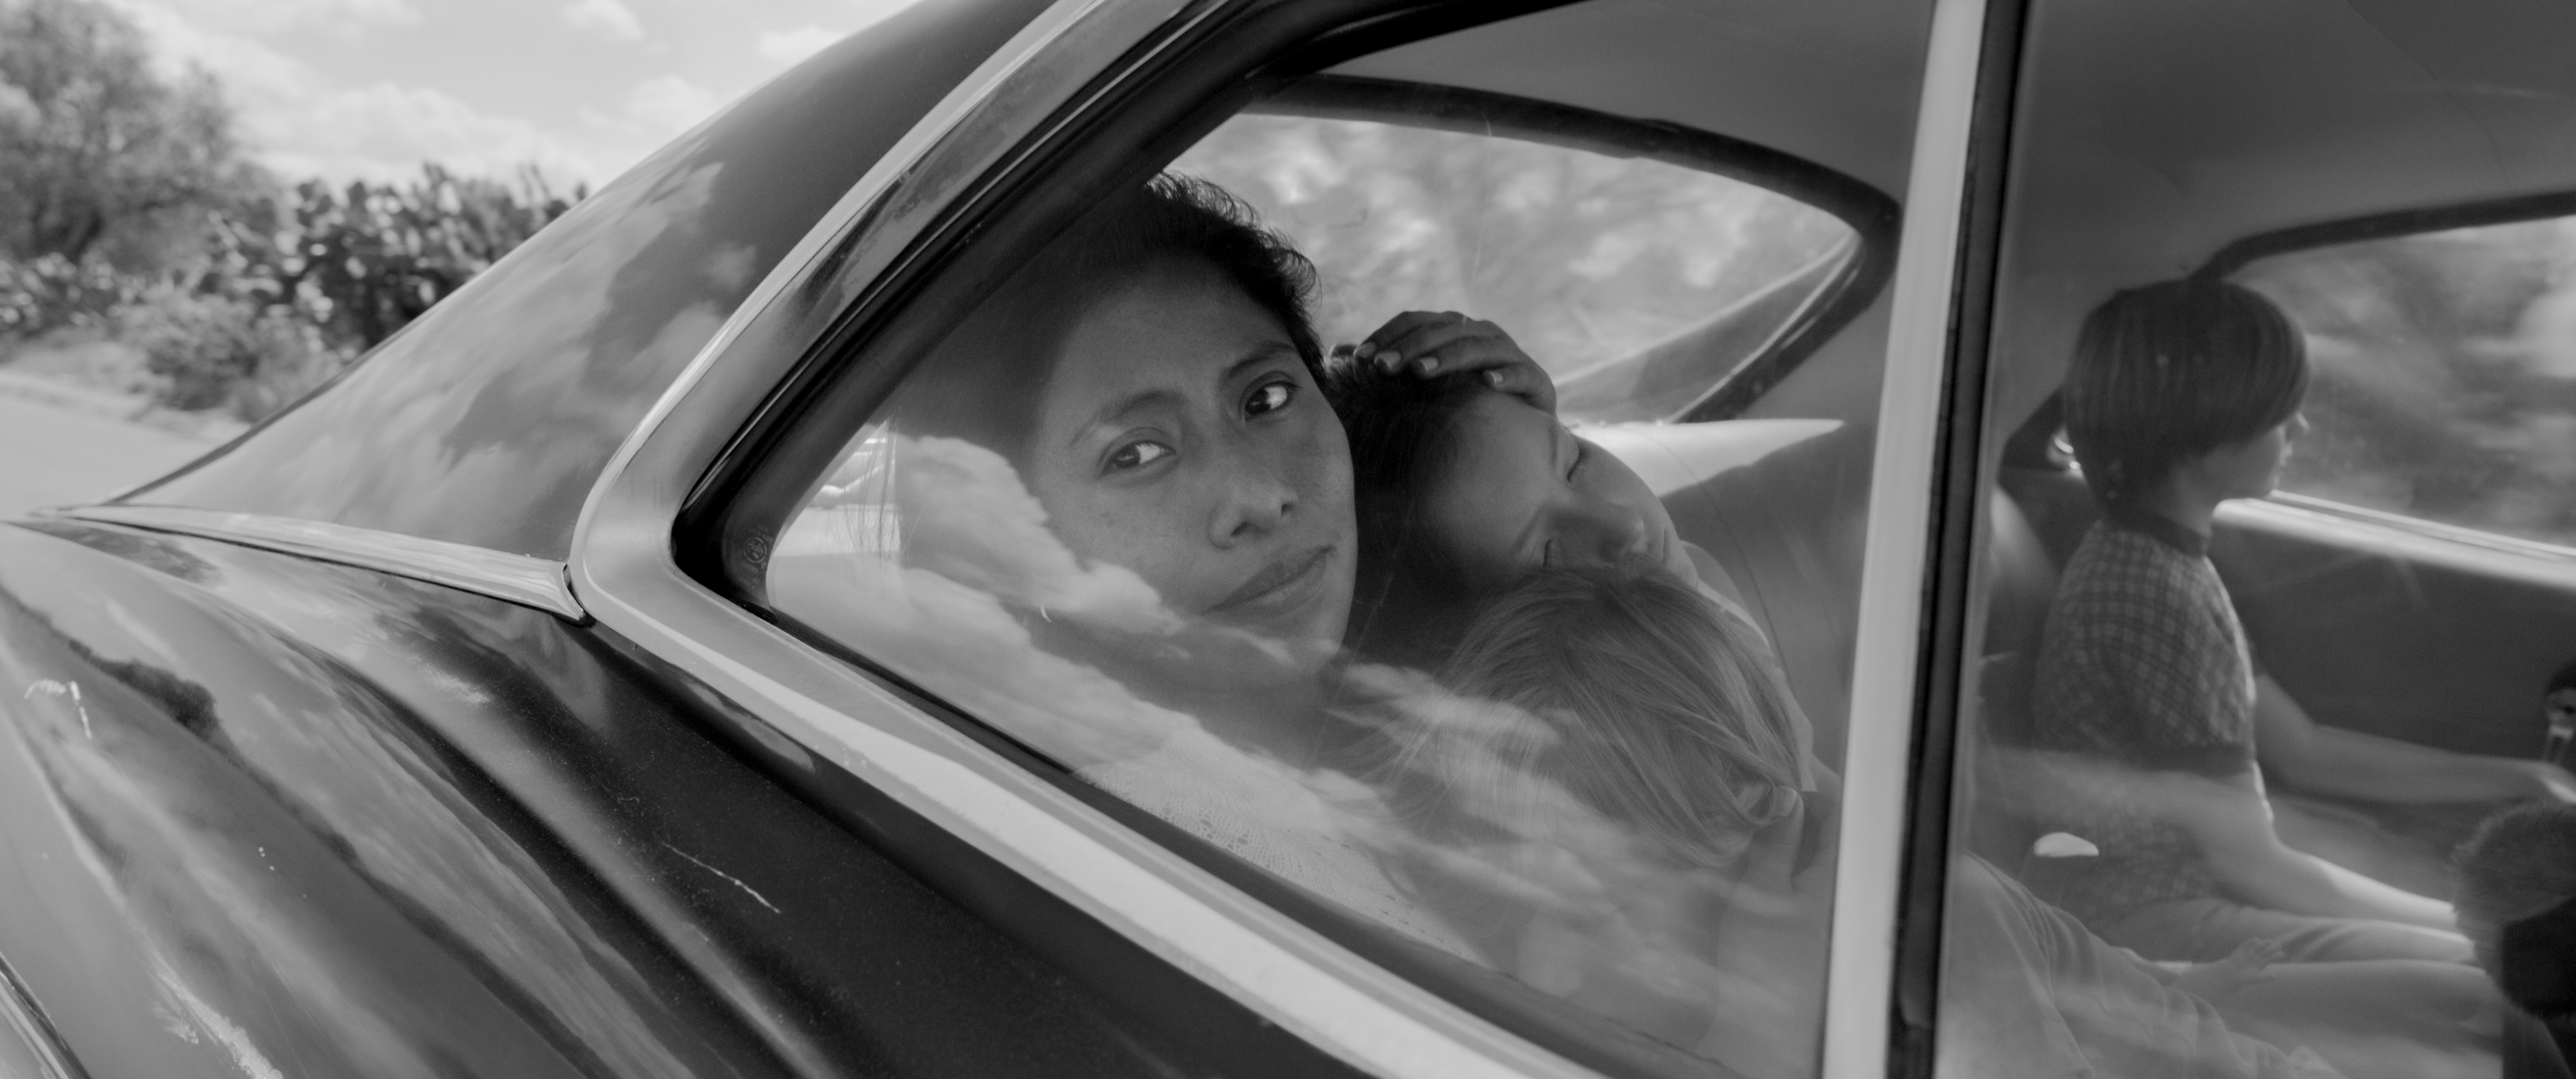 Yalitza Aparicio as Cleo, Marco Graf as Pepe, Carlos Peralta Jacobson as Paco, and Daniela Demesa as Sofi in Roma, written and directed by Alfonso Cuarón.